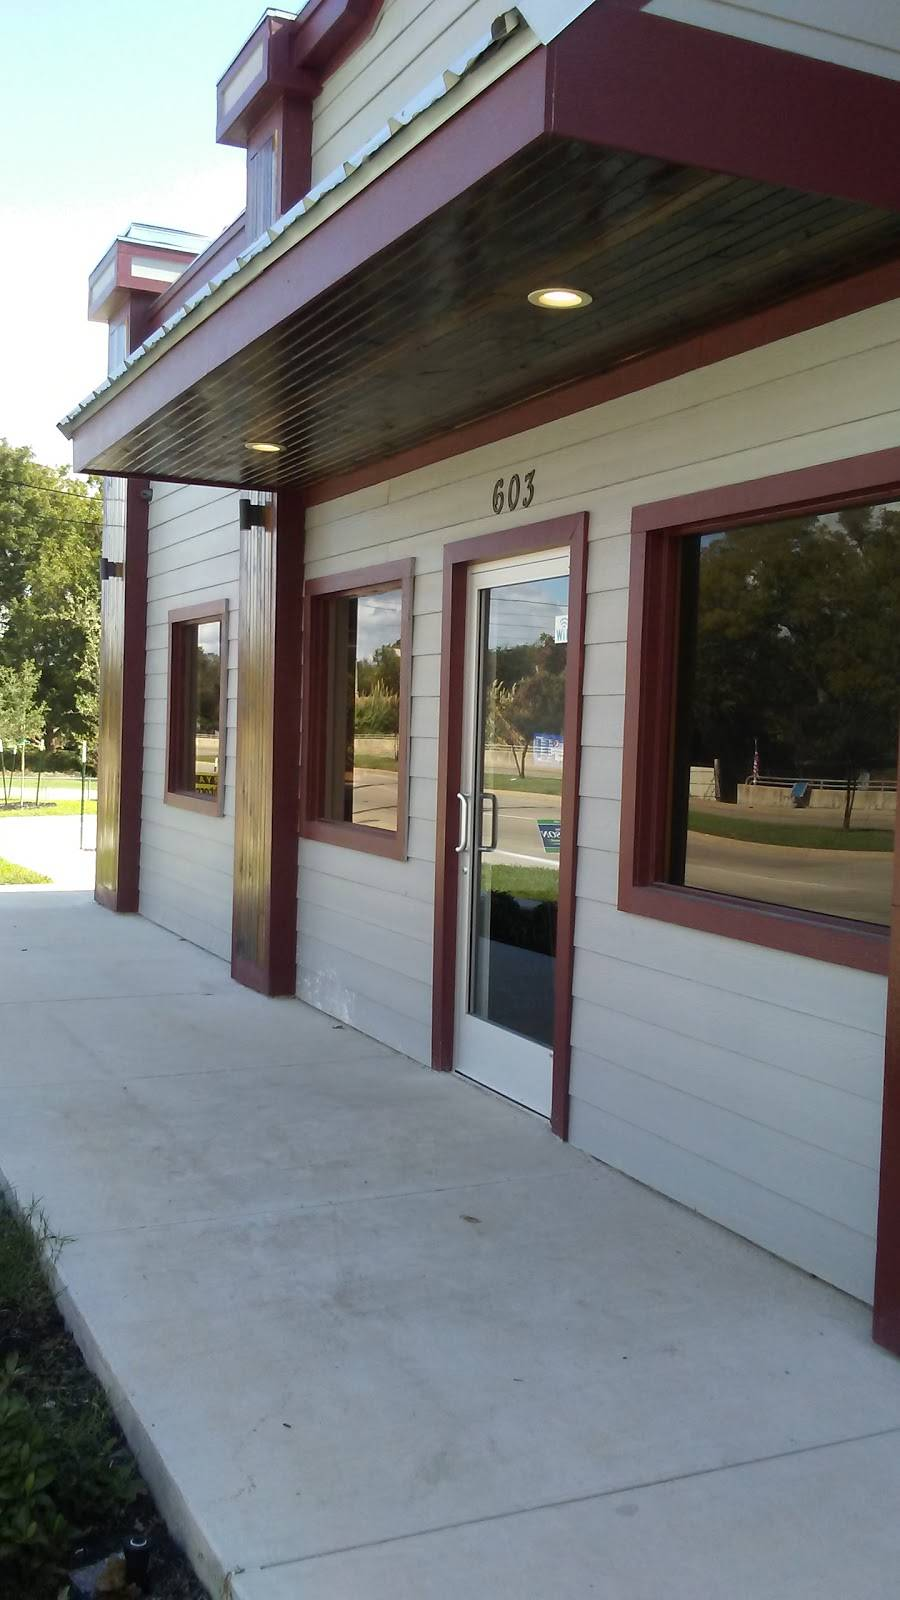 Shannons Cafe | cafe | 601 San Jacinto Ln, Bryan, TX 77803, USA | 9797790842 OR +1 979-779-0842